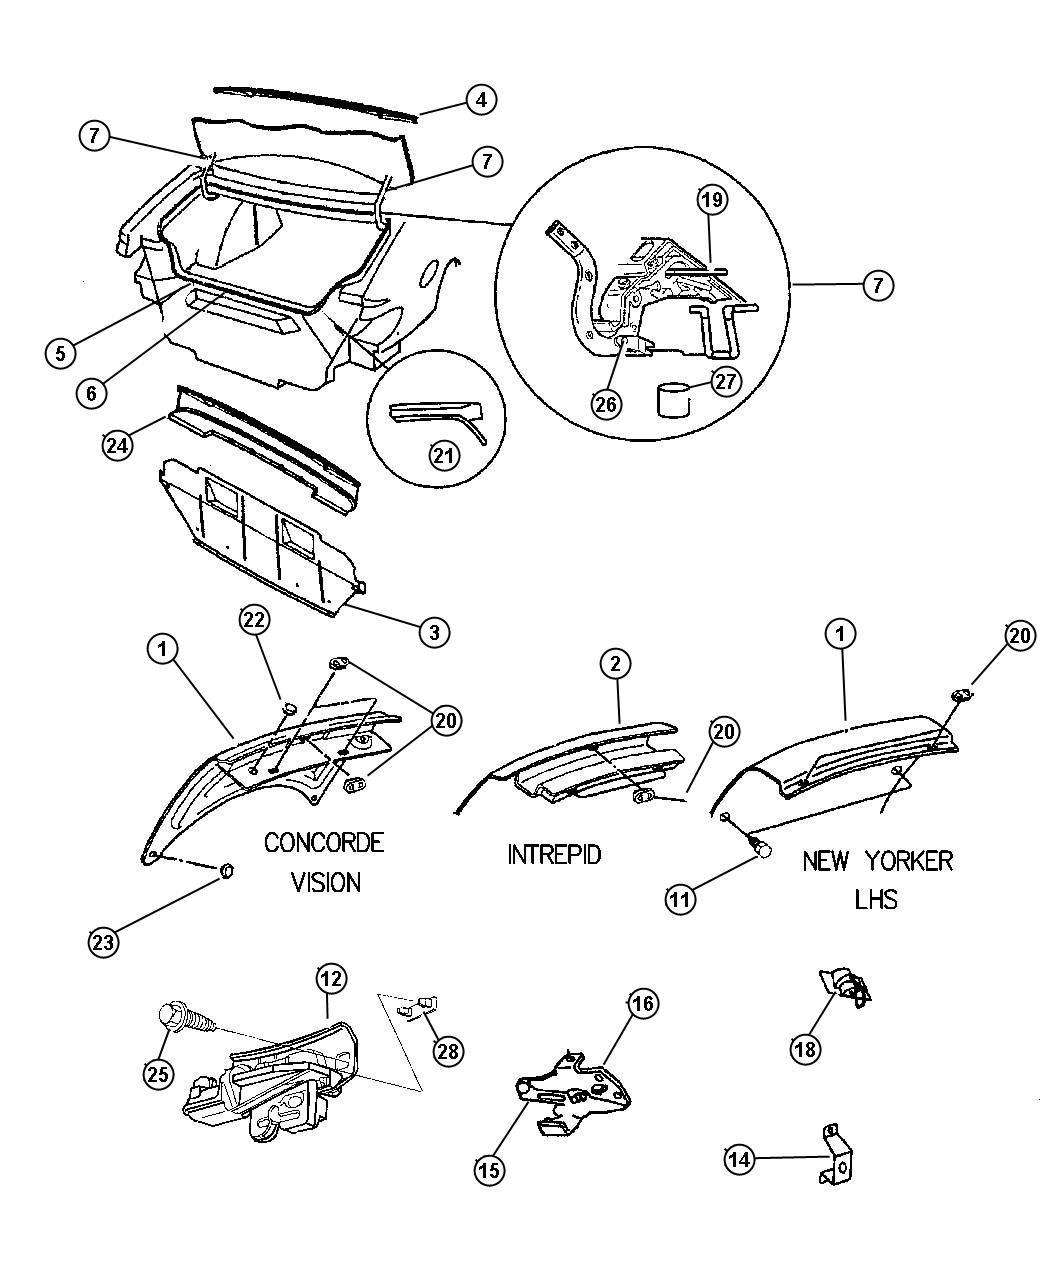 00 Mitsubishi Eclipse Fuse Box Diagram. Mitsubishi. Auto